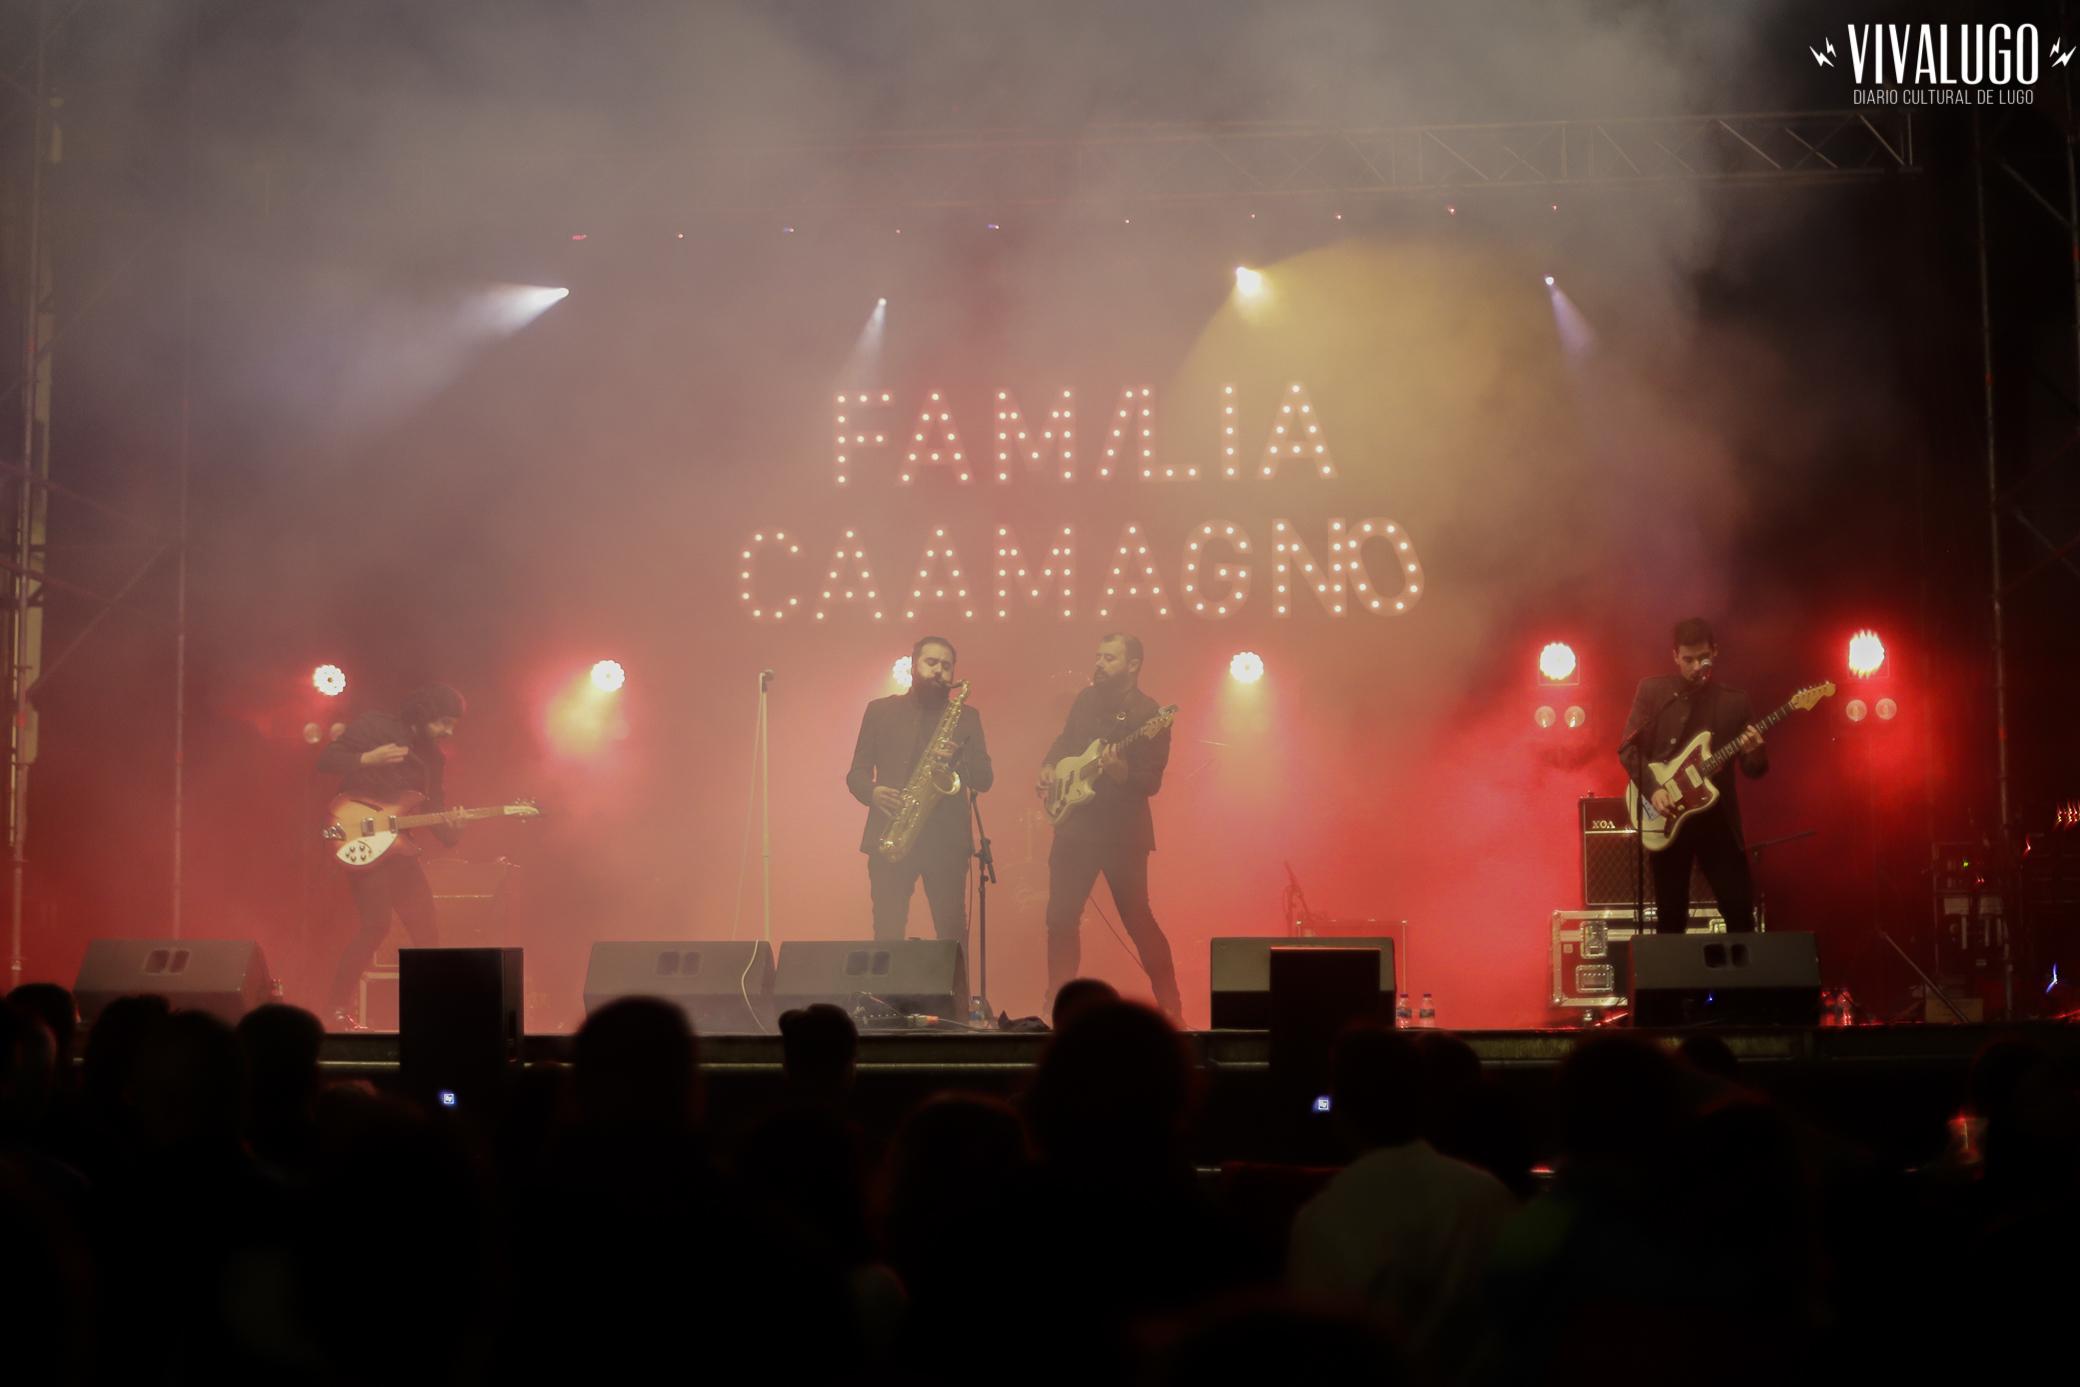 Familia Caamagno